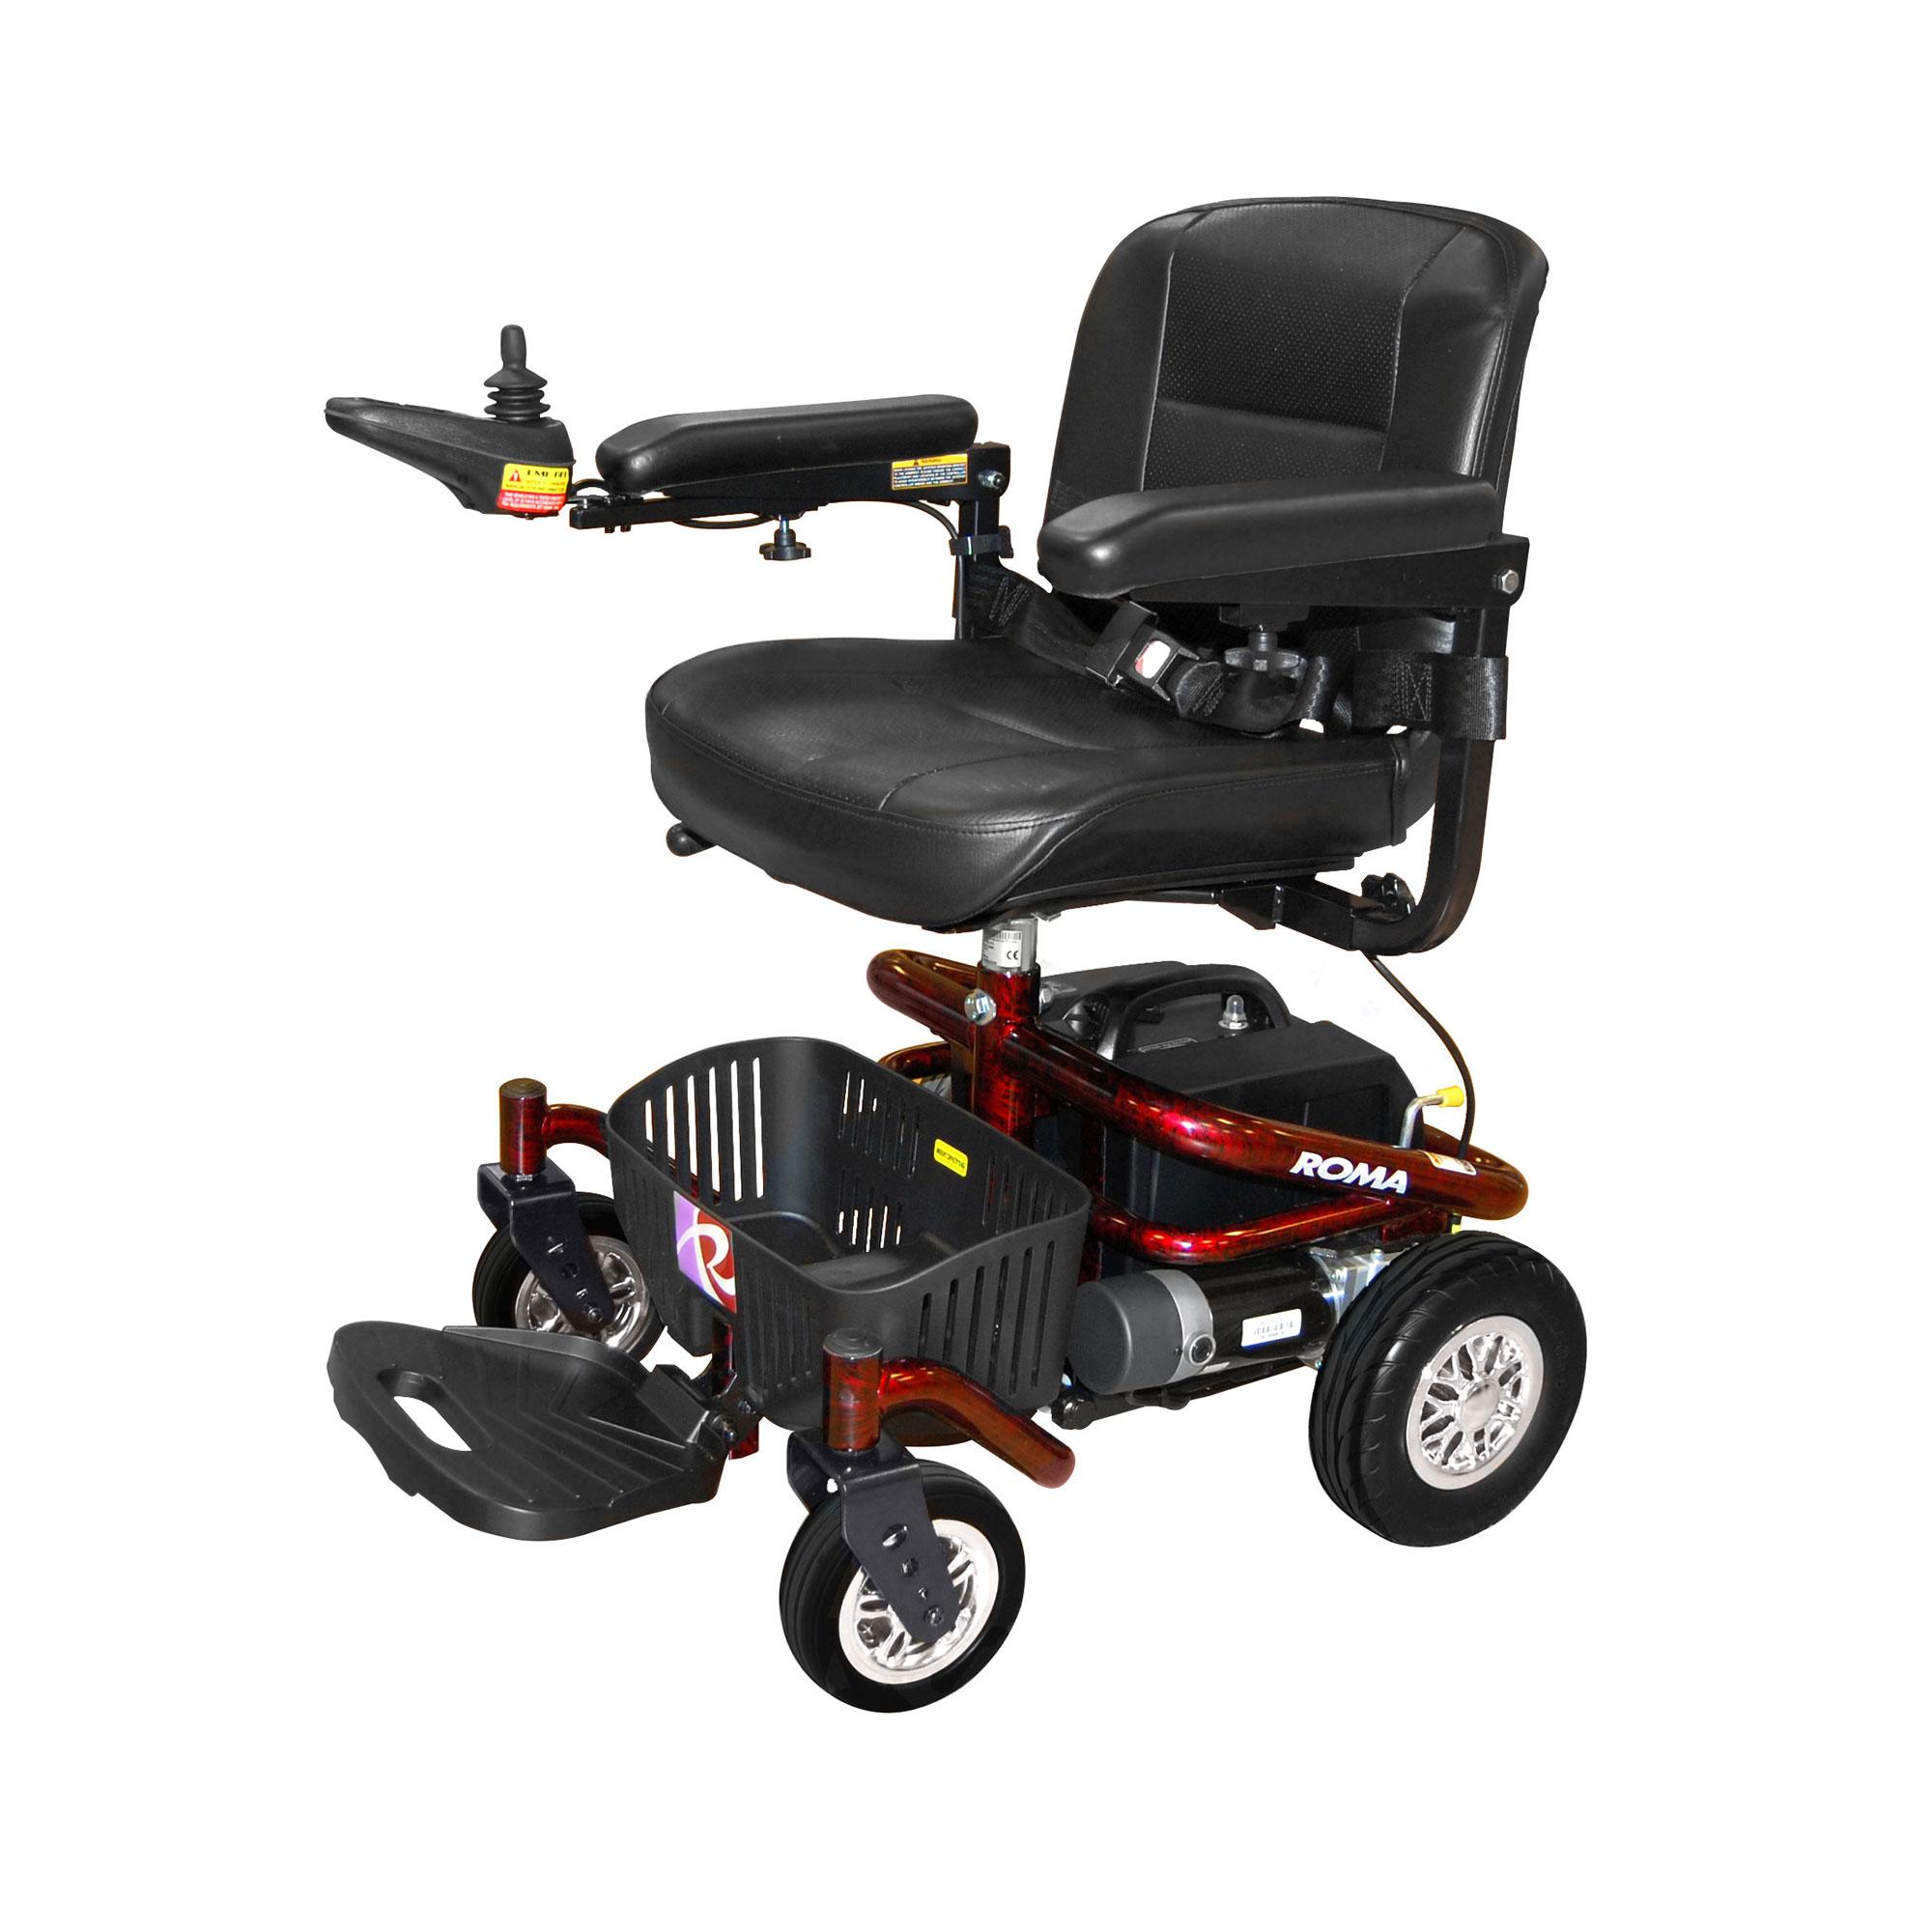 Roma Reno II Power Chair Roma Medical